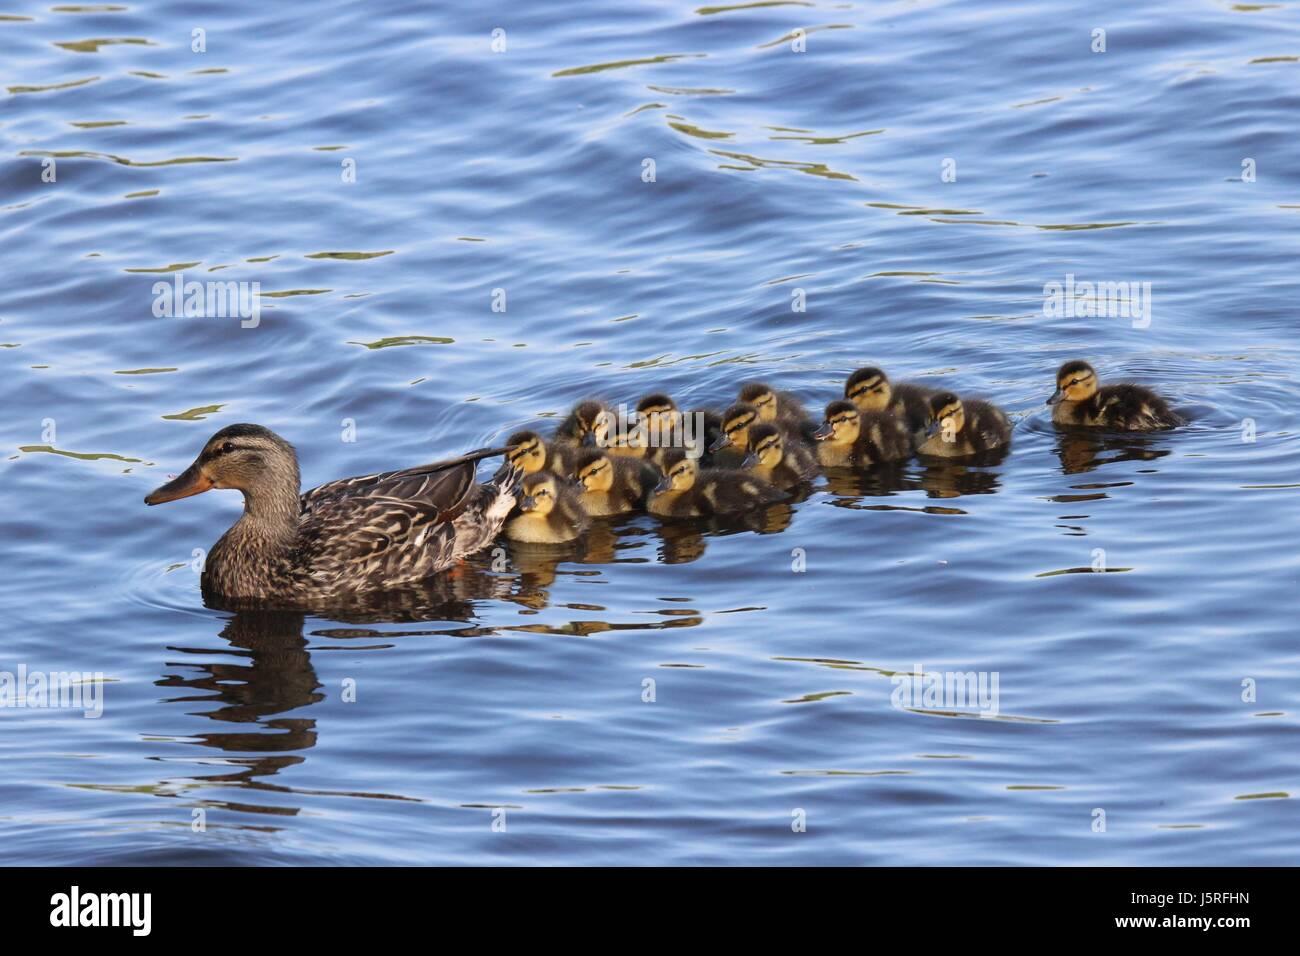 mother duck ducklings water mallard stock photos u0026 mother duck